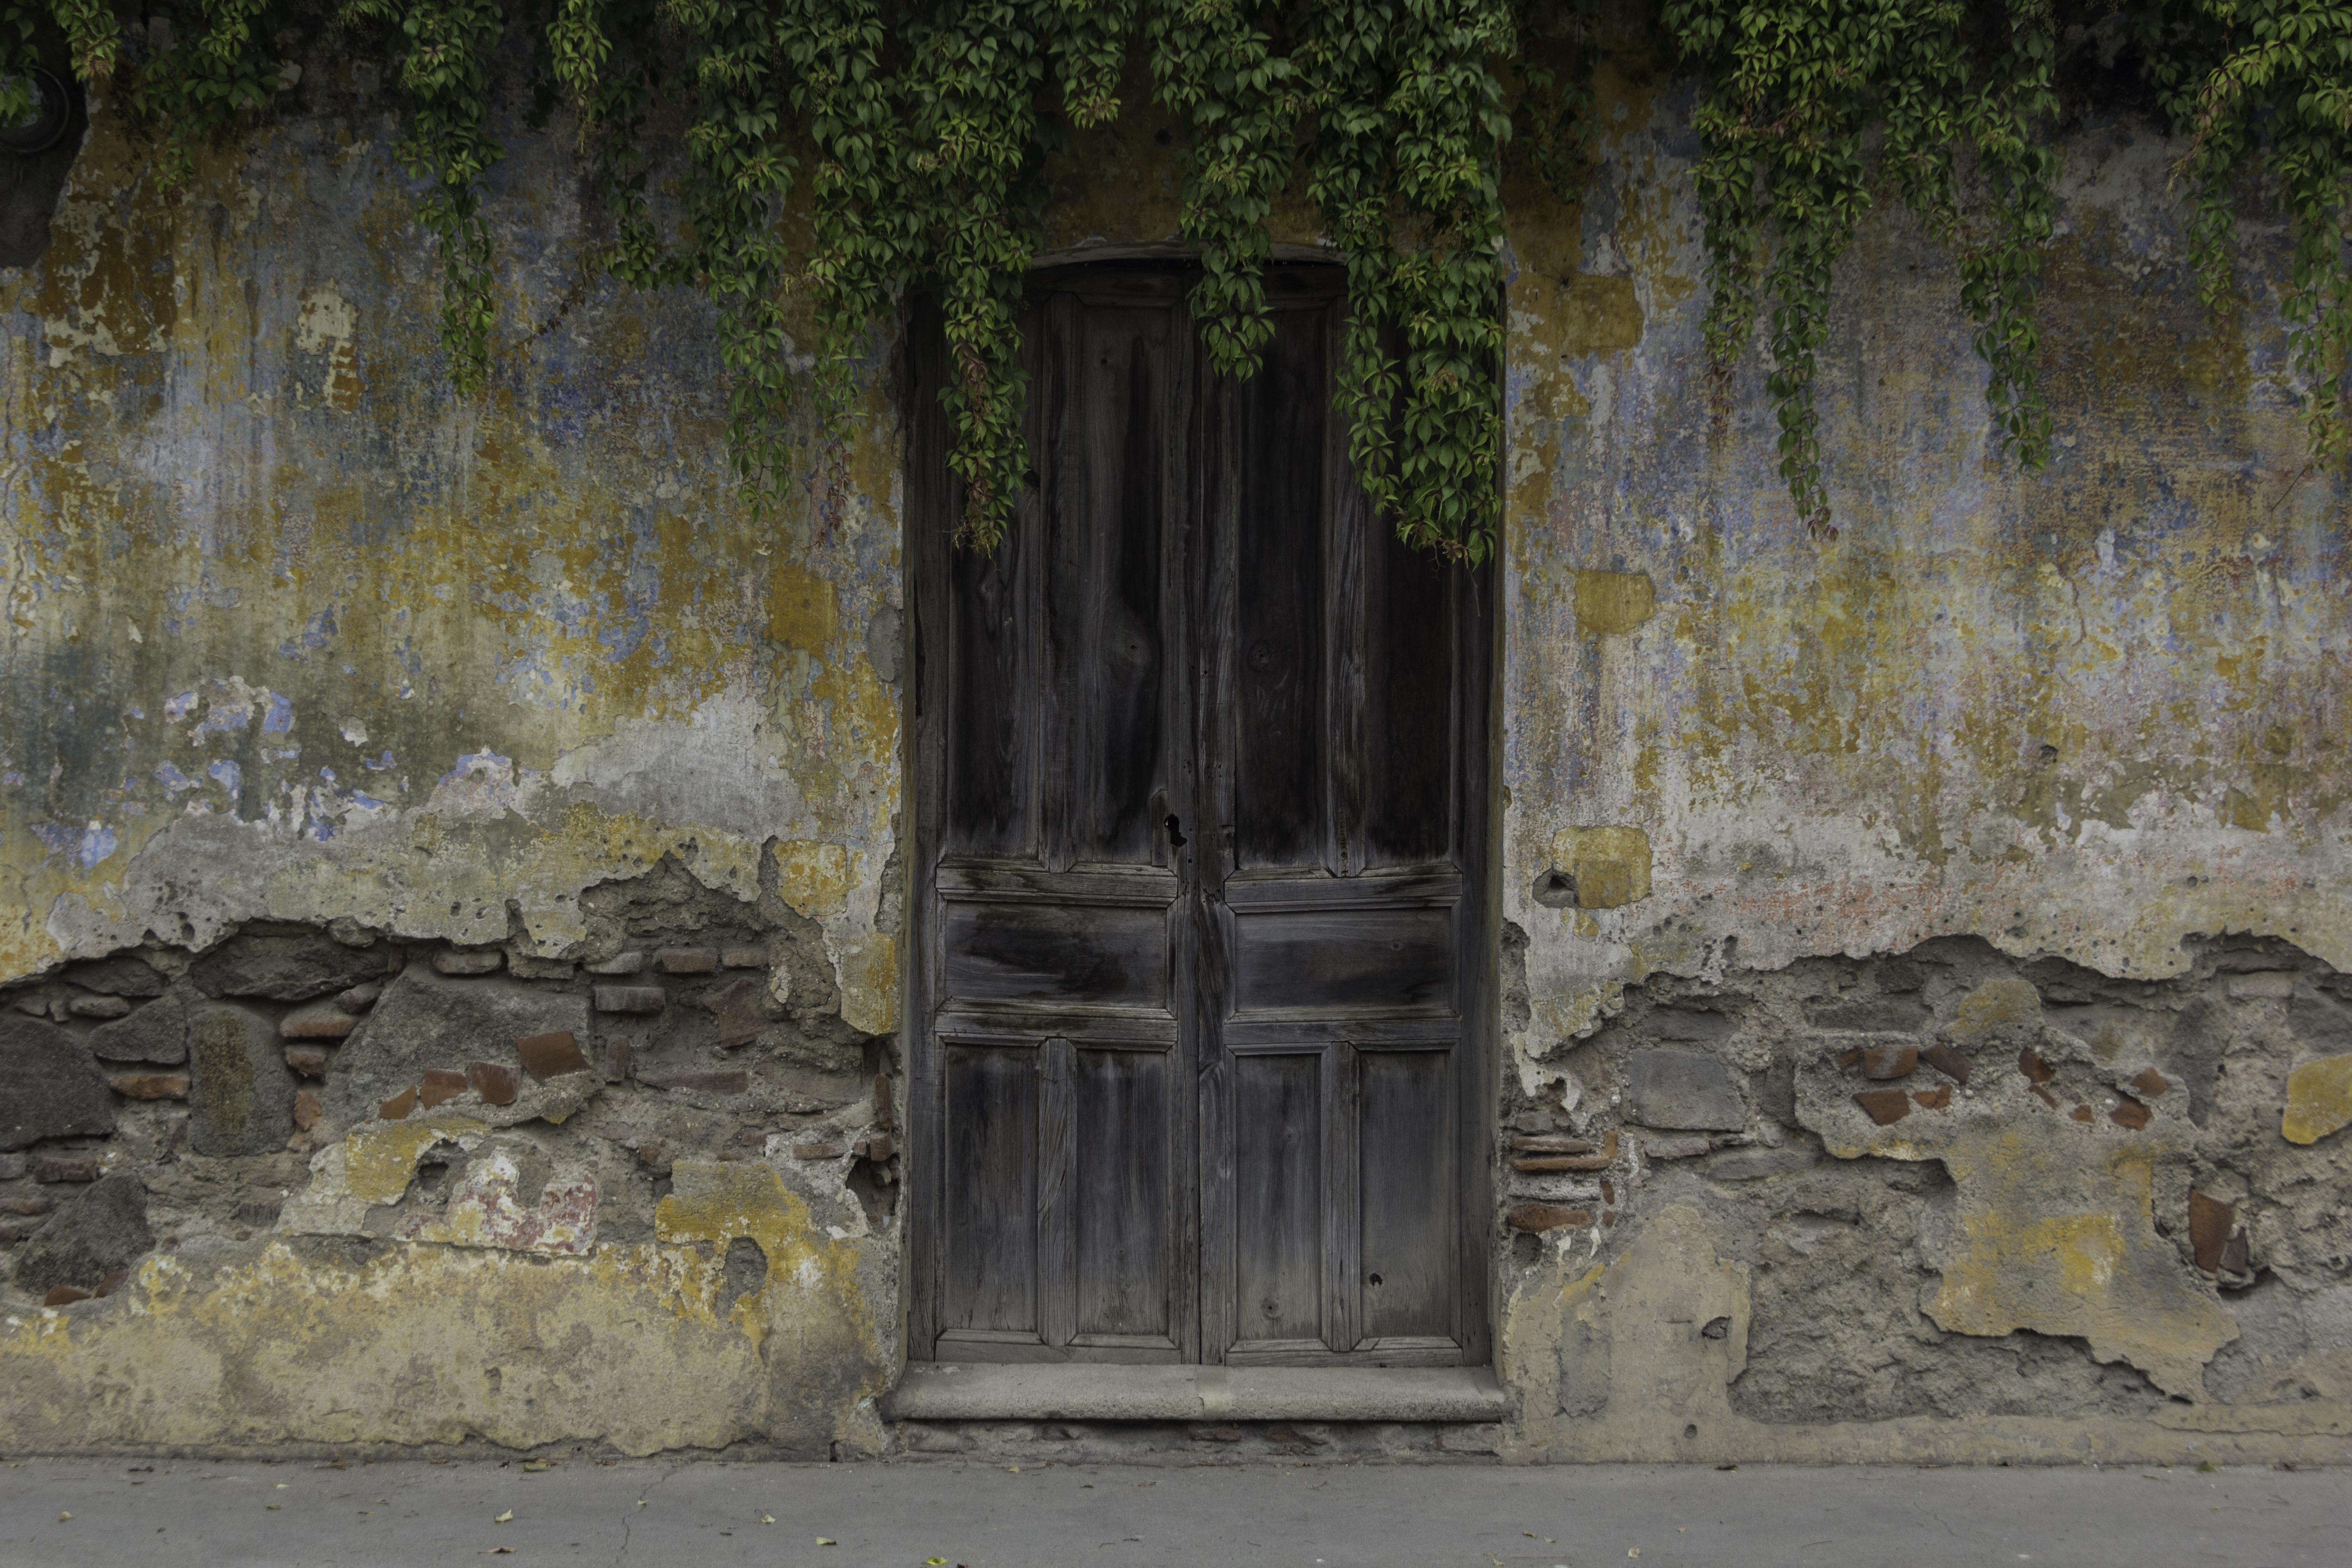 Fotos gratis rock arquitectura madera antiguo pared for Imagenes de puertas de madera antiguas